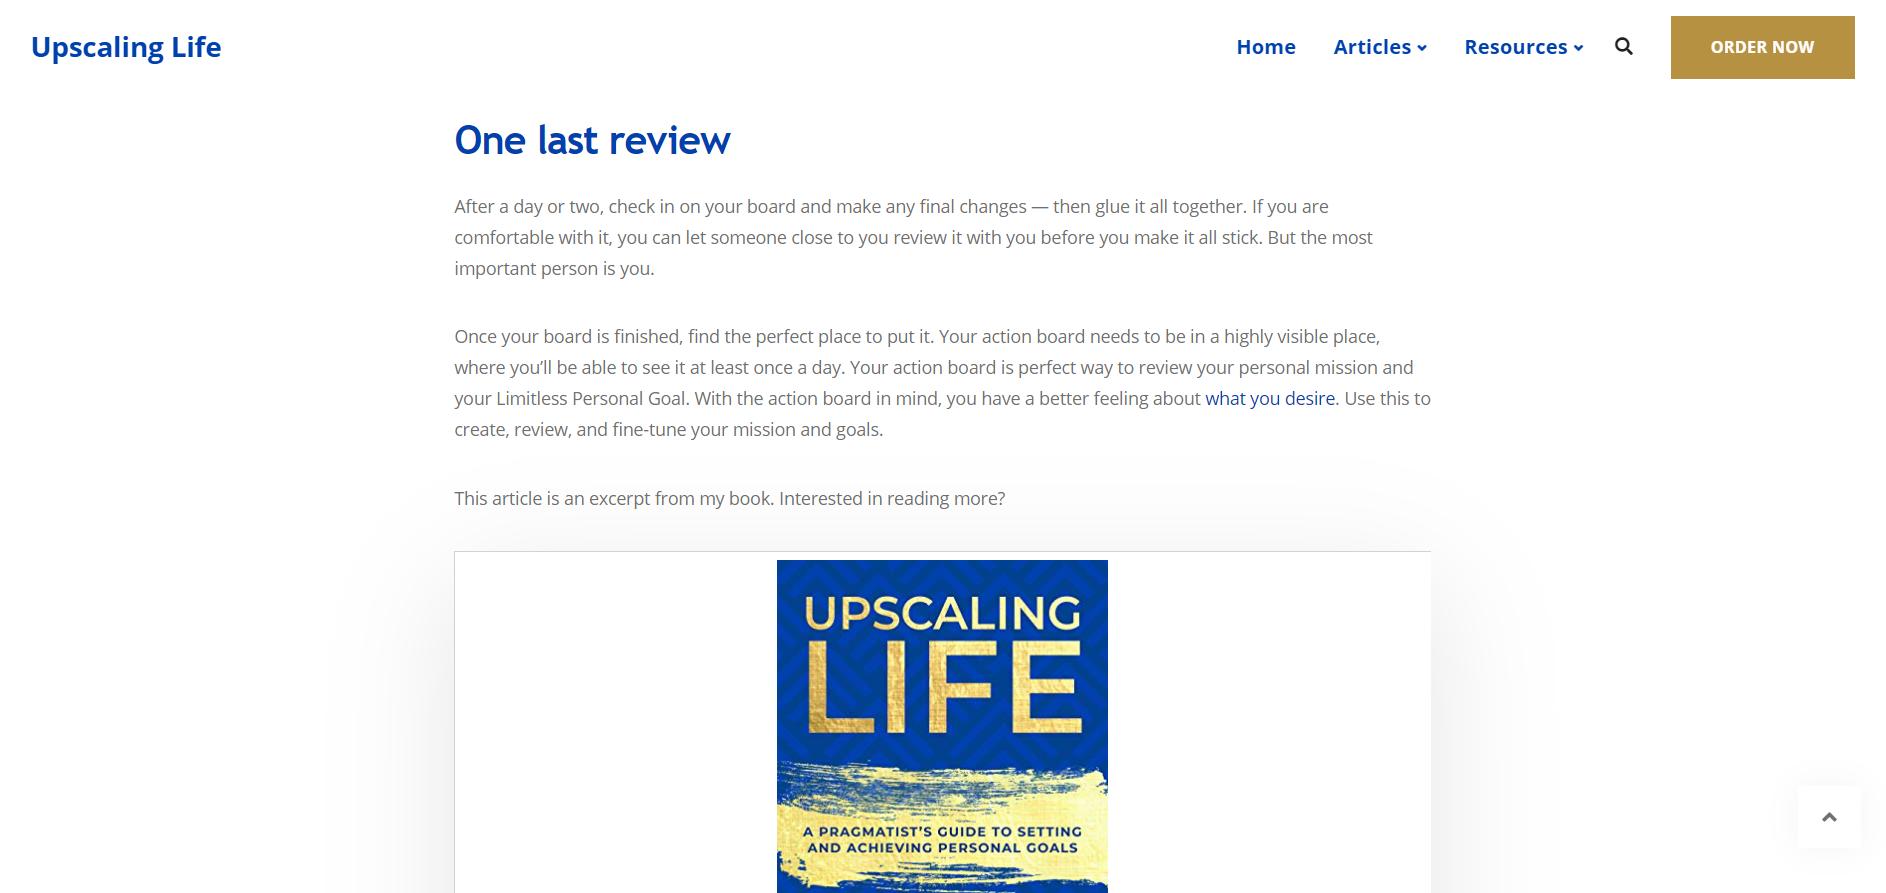 Upscaling Life 4